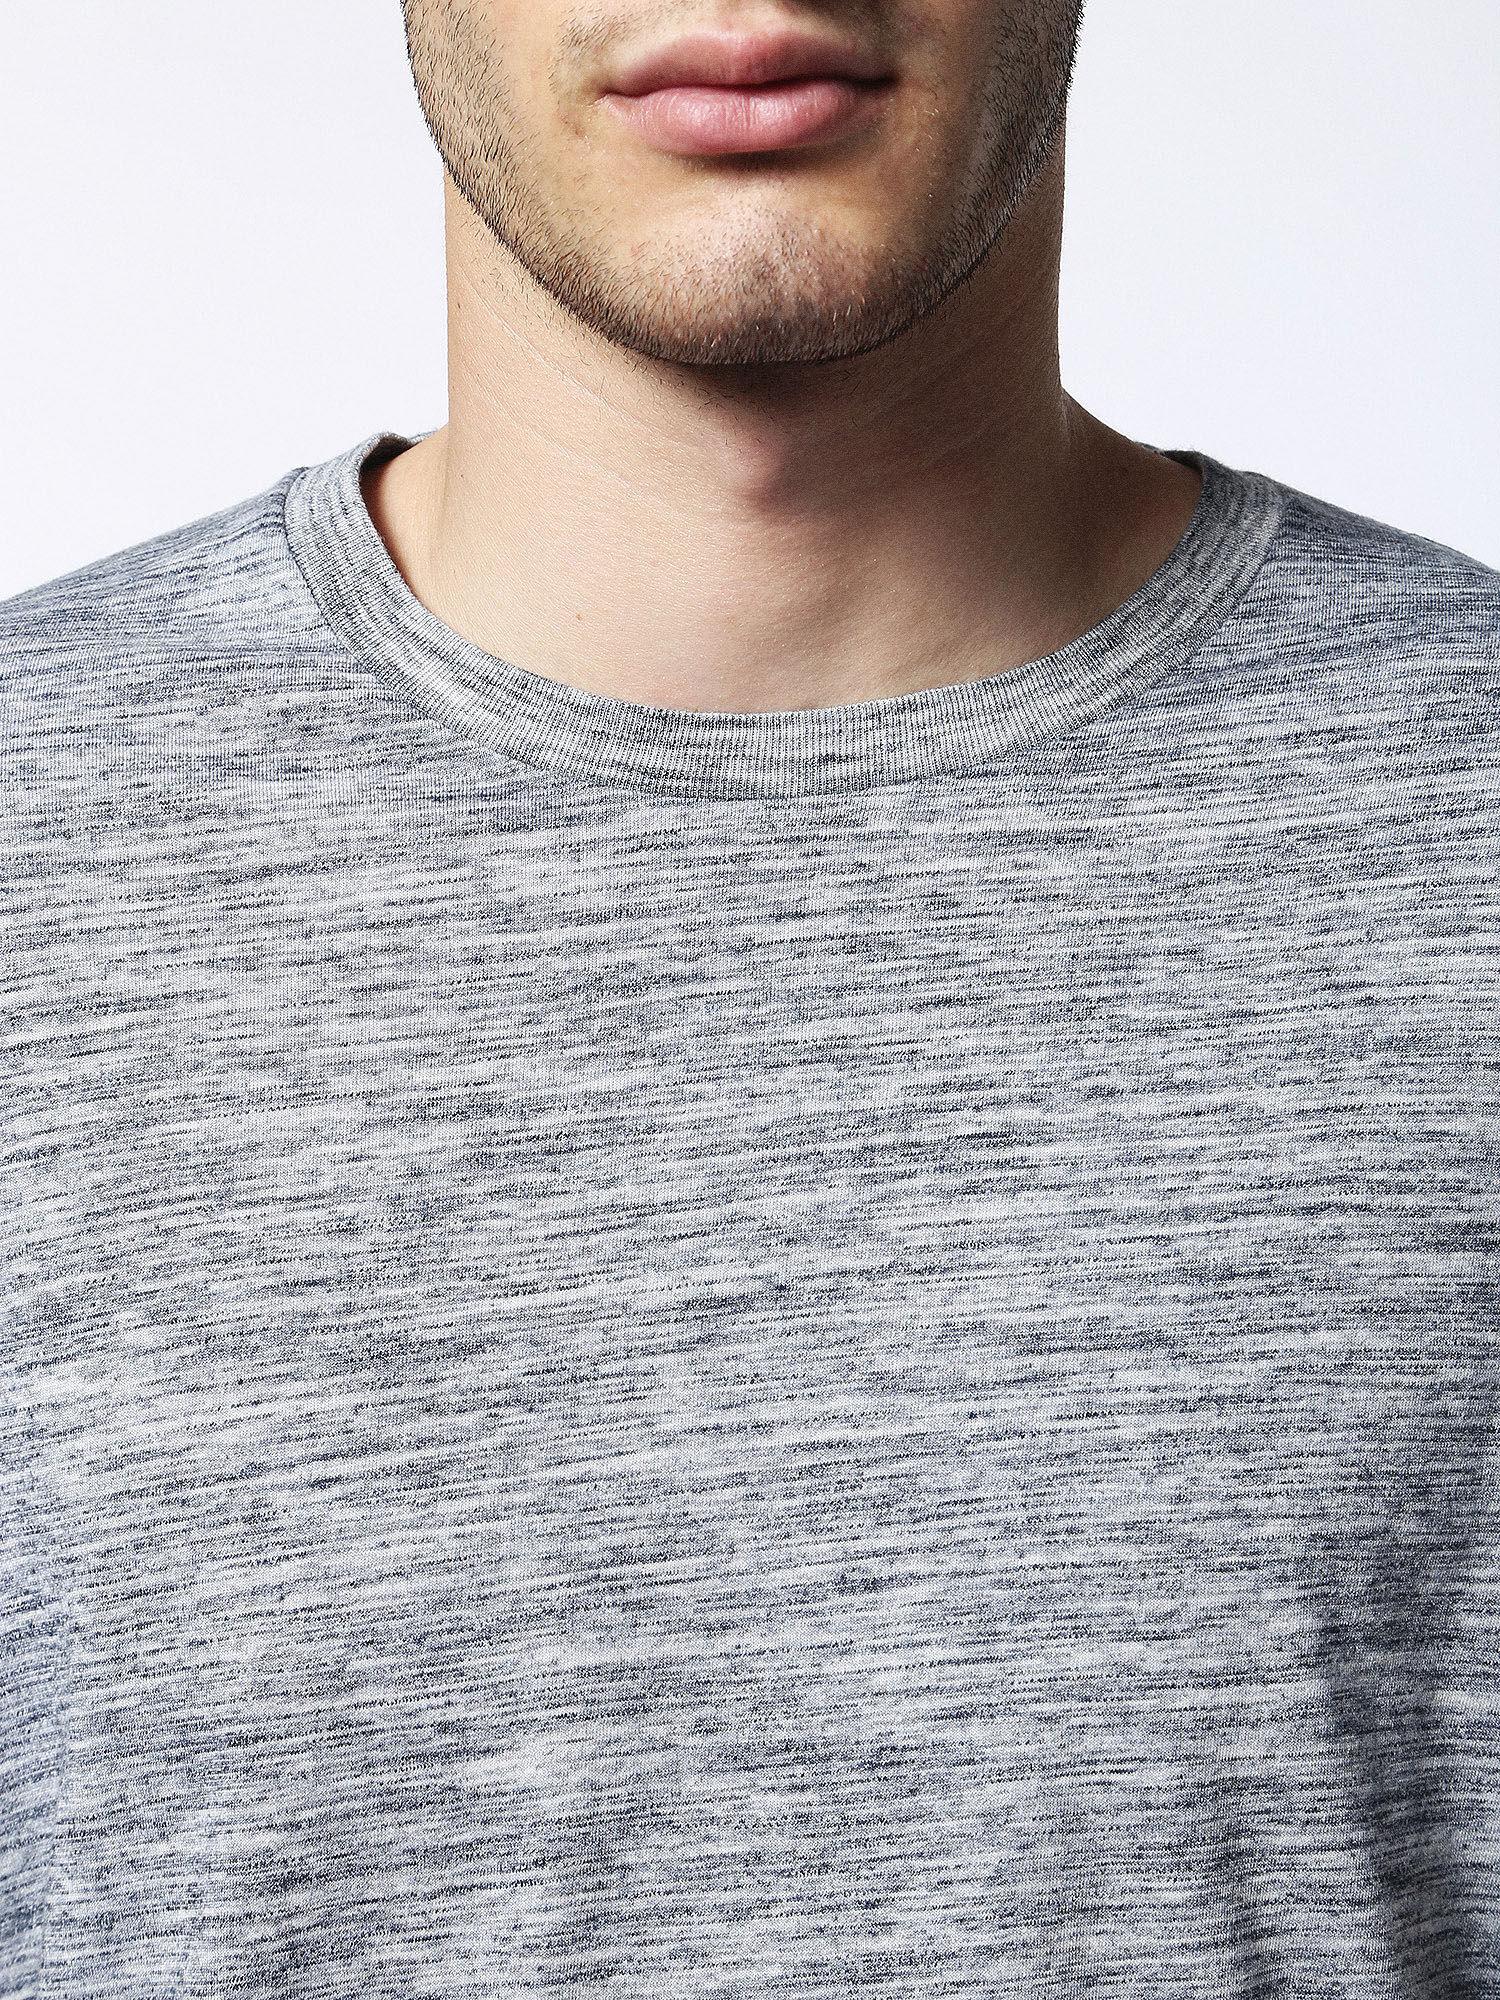 00SN1L0GAOB T-Shirts Man T-SIRIO by Diesel Melange Grey